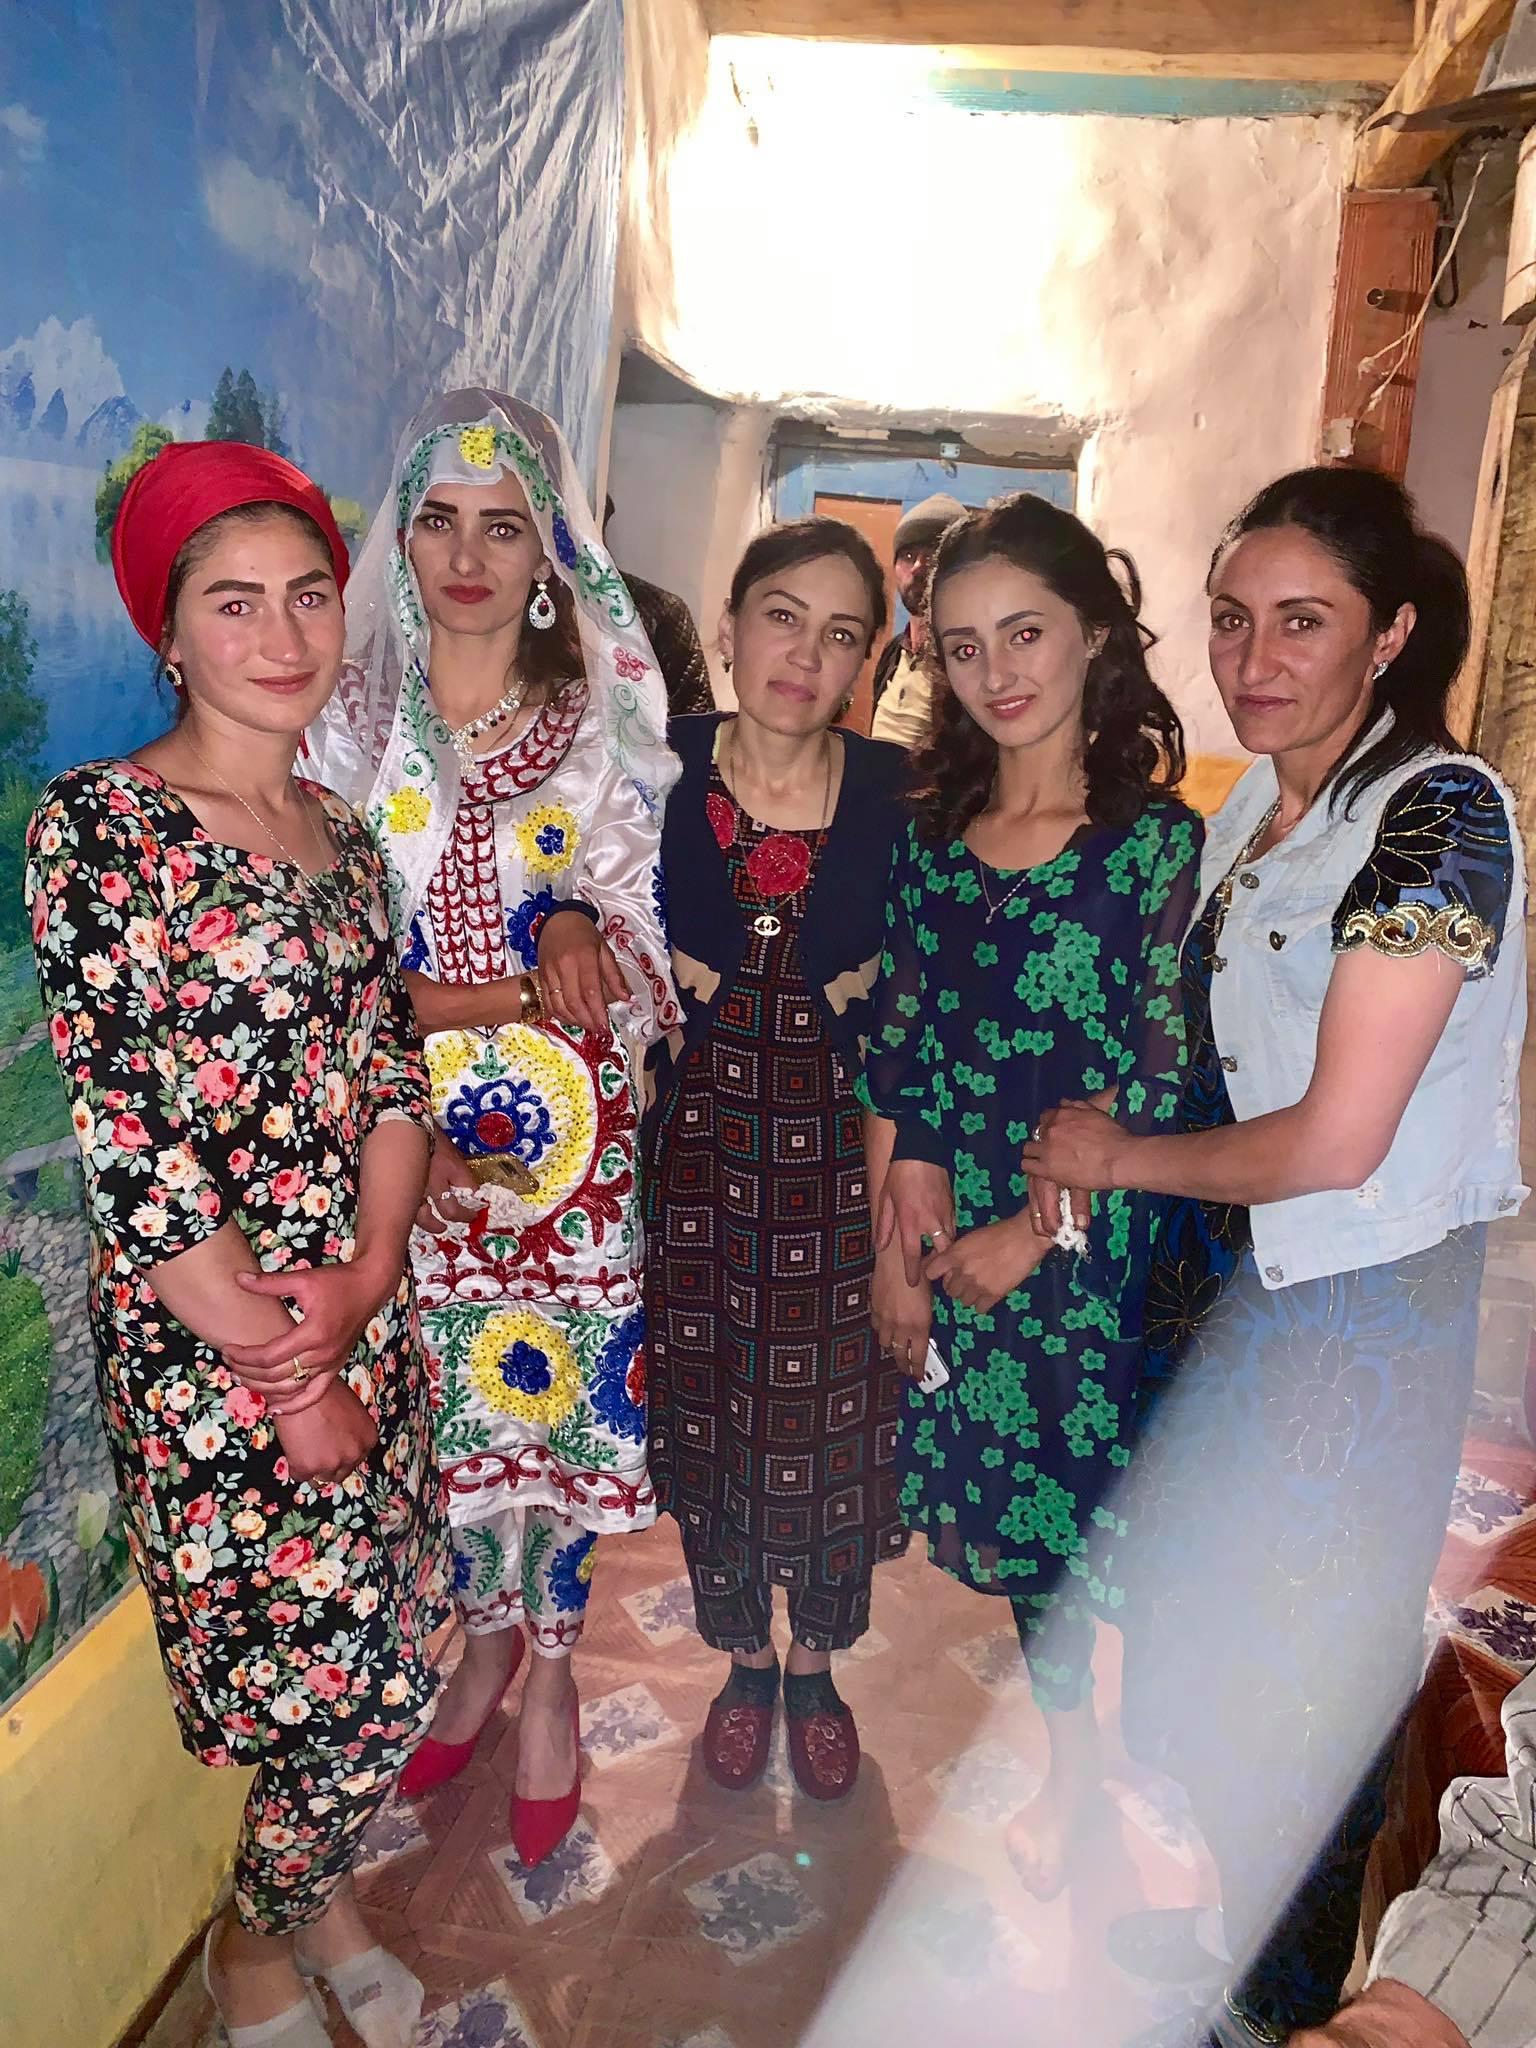 Kach Solo Travels in 2019 Experiencing a Traditional Wakhan Wedding in Tajikistan10.jpg